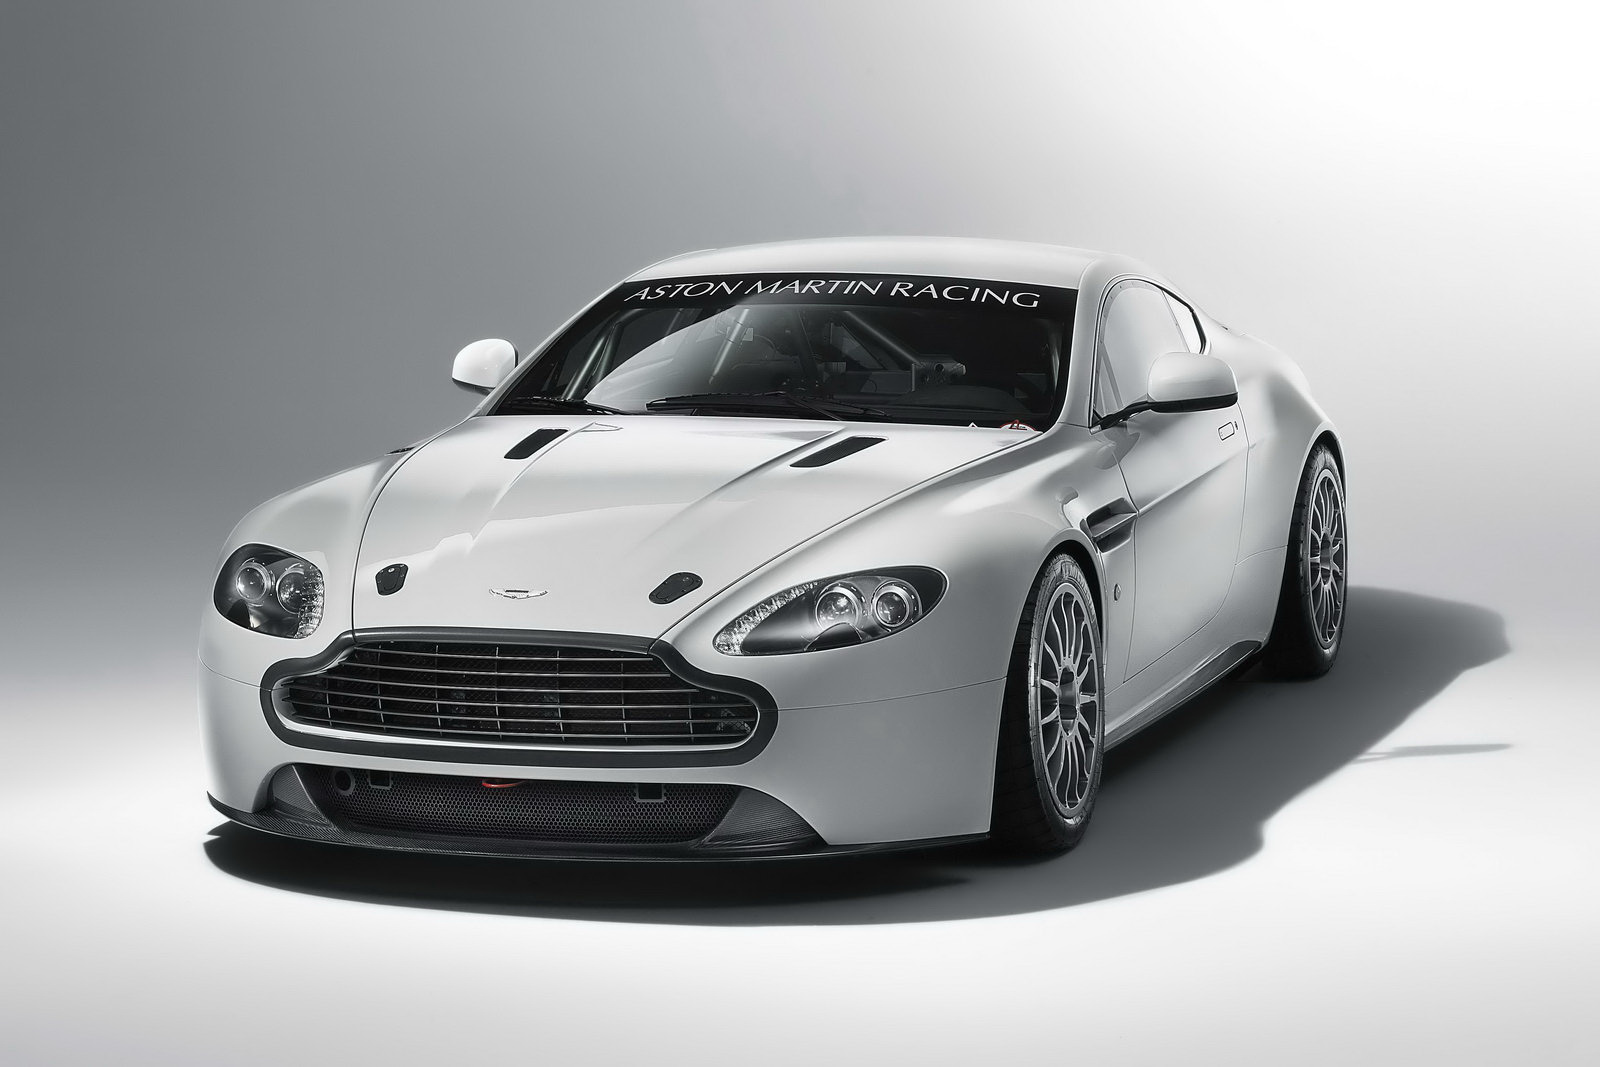 2011 Aston Martin Vantage Gt4 Sports Car